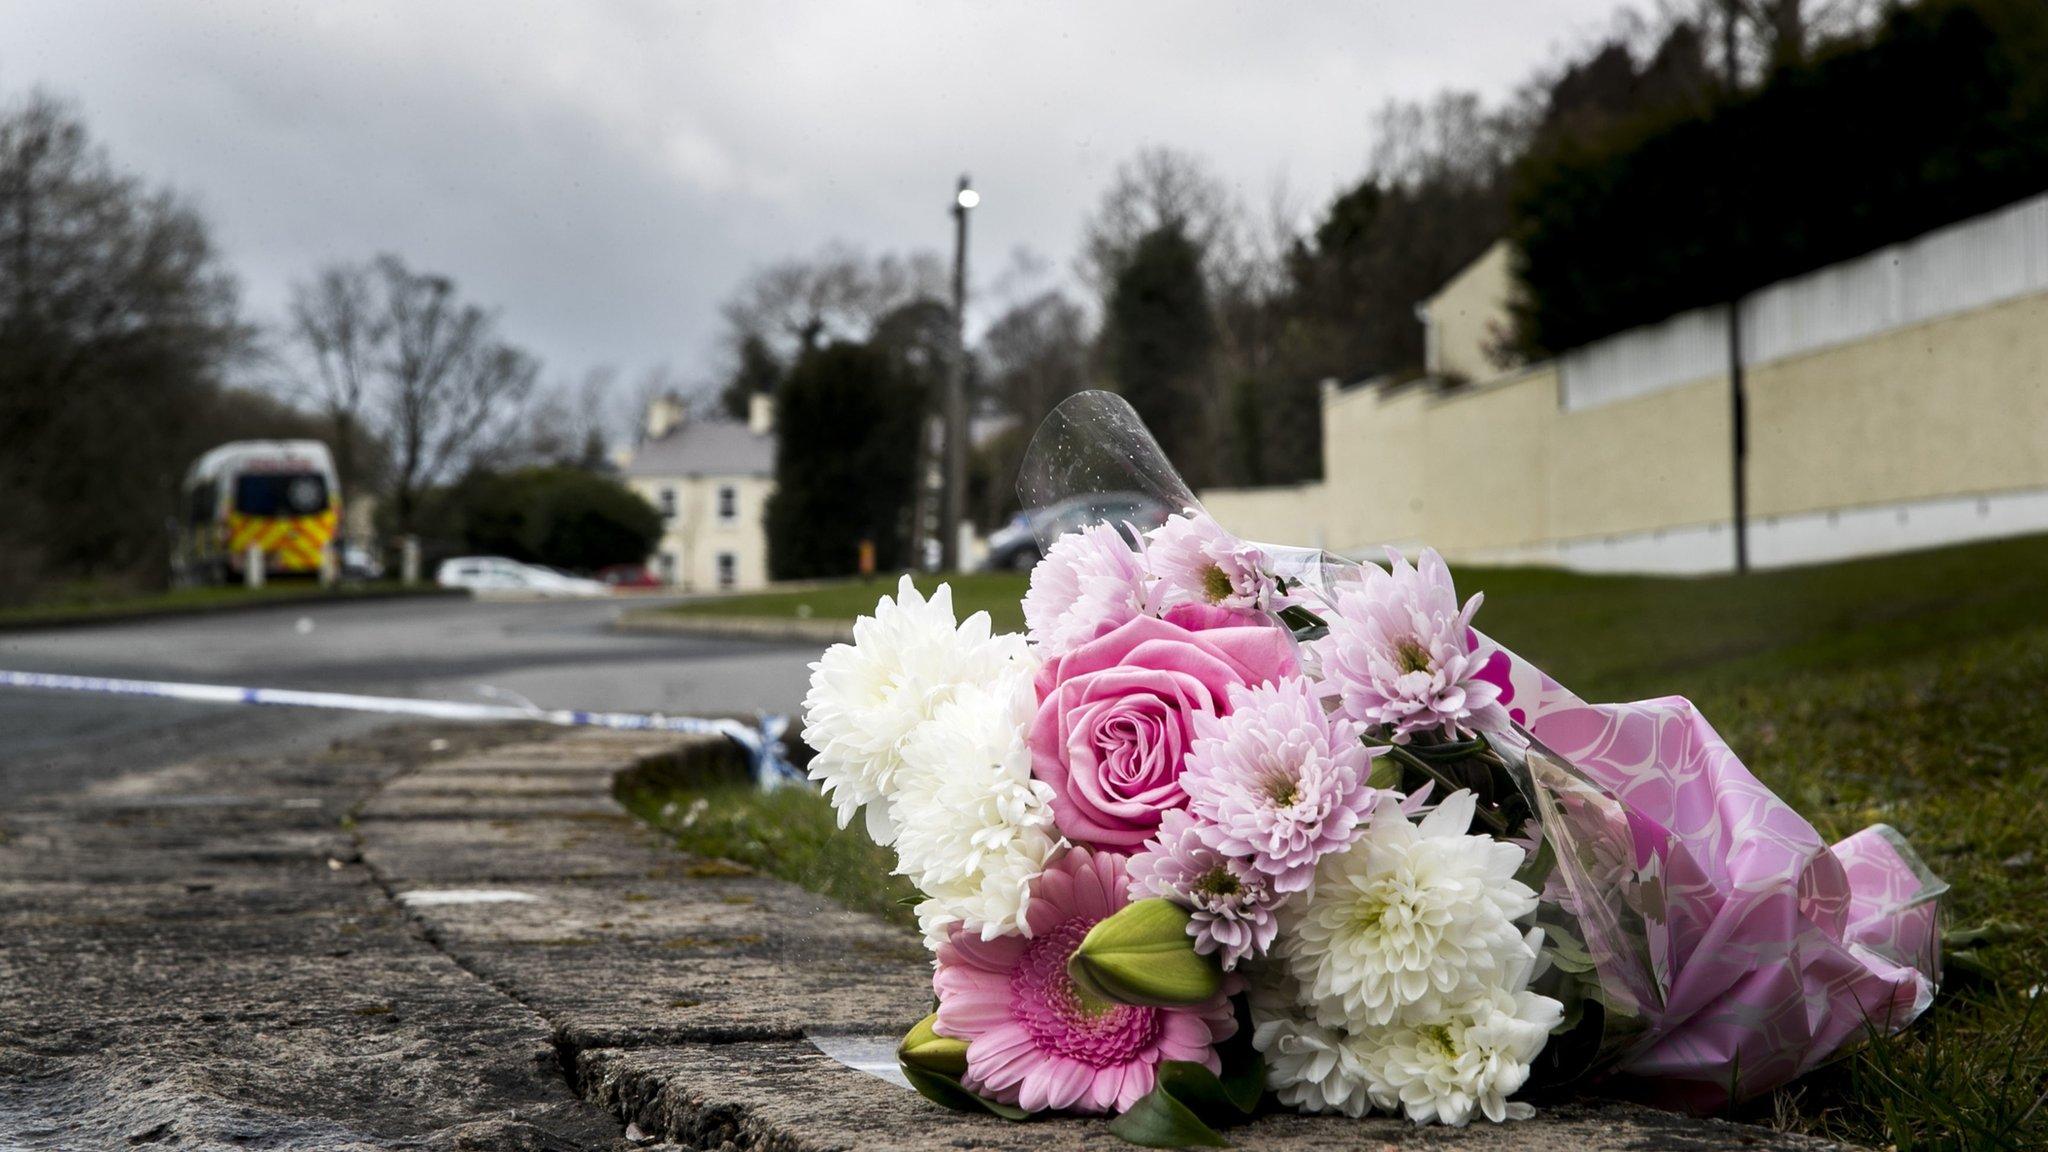 Cookstown hotel disco 'crush': Three teens dead